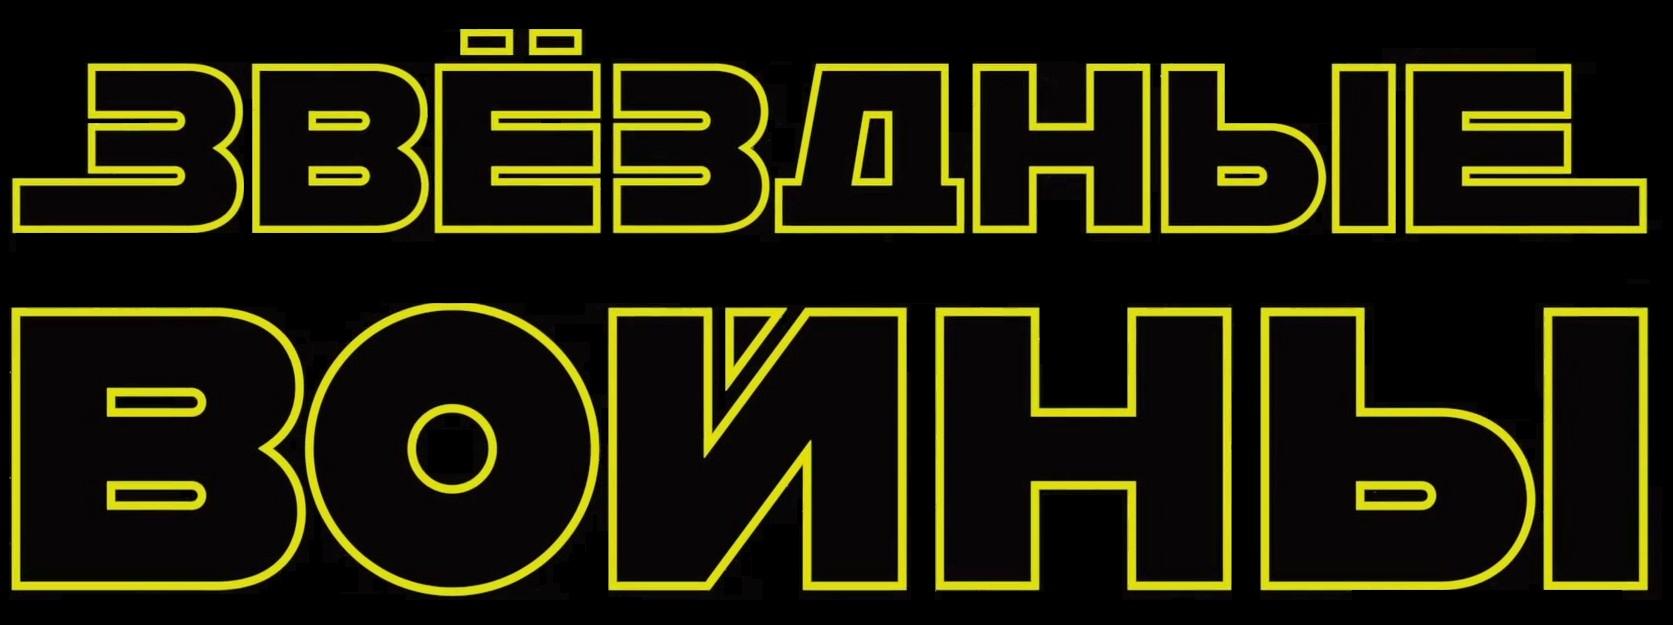 Star_Wars_Russian_Crawl_logo.jpg